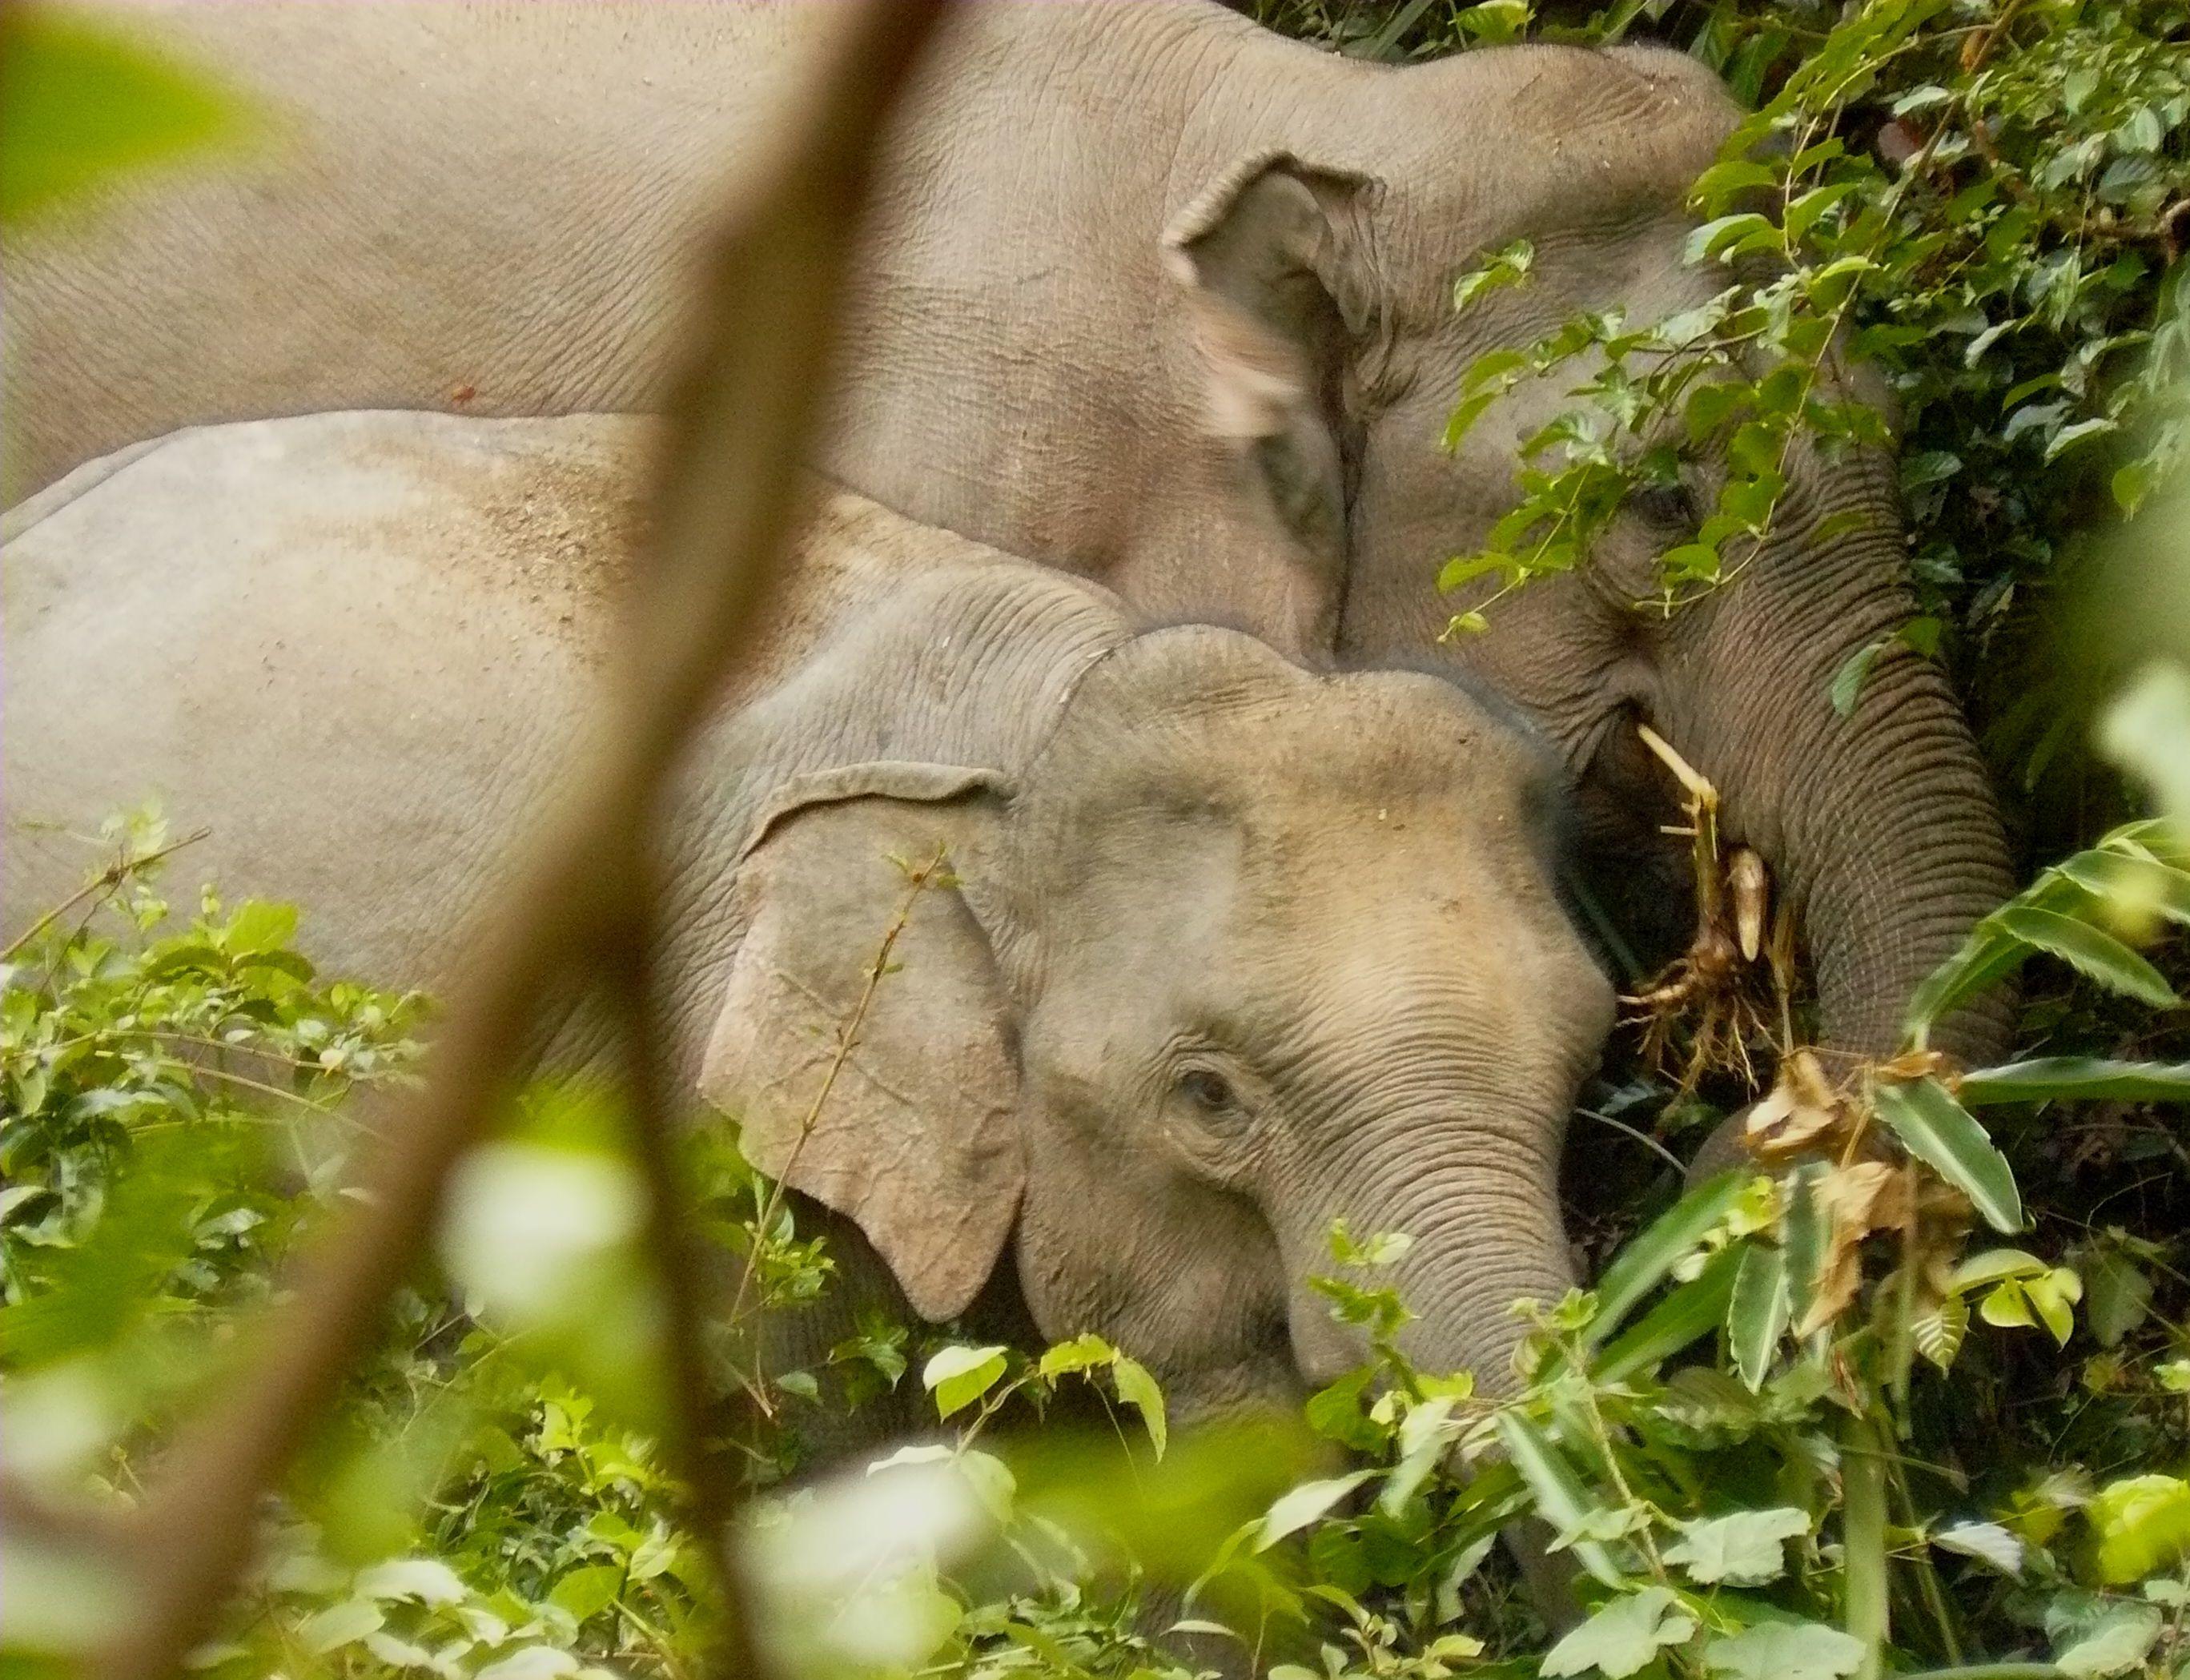 File:Wild Asian elephants at Khao Yai NP.JPG - Wikimedia Commons